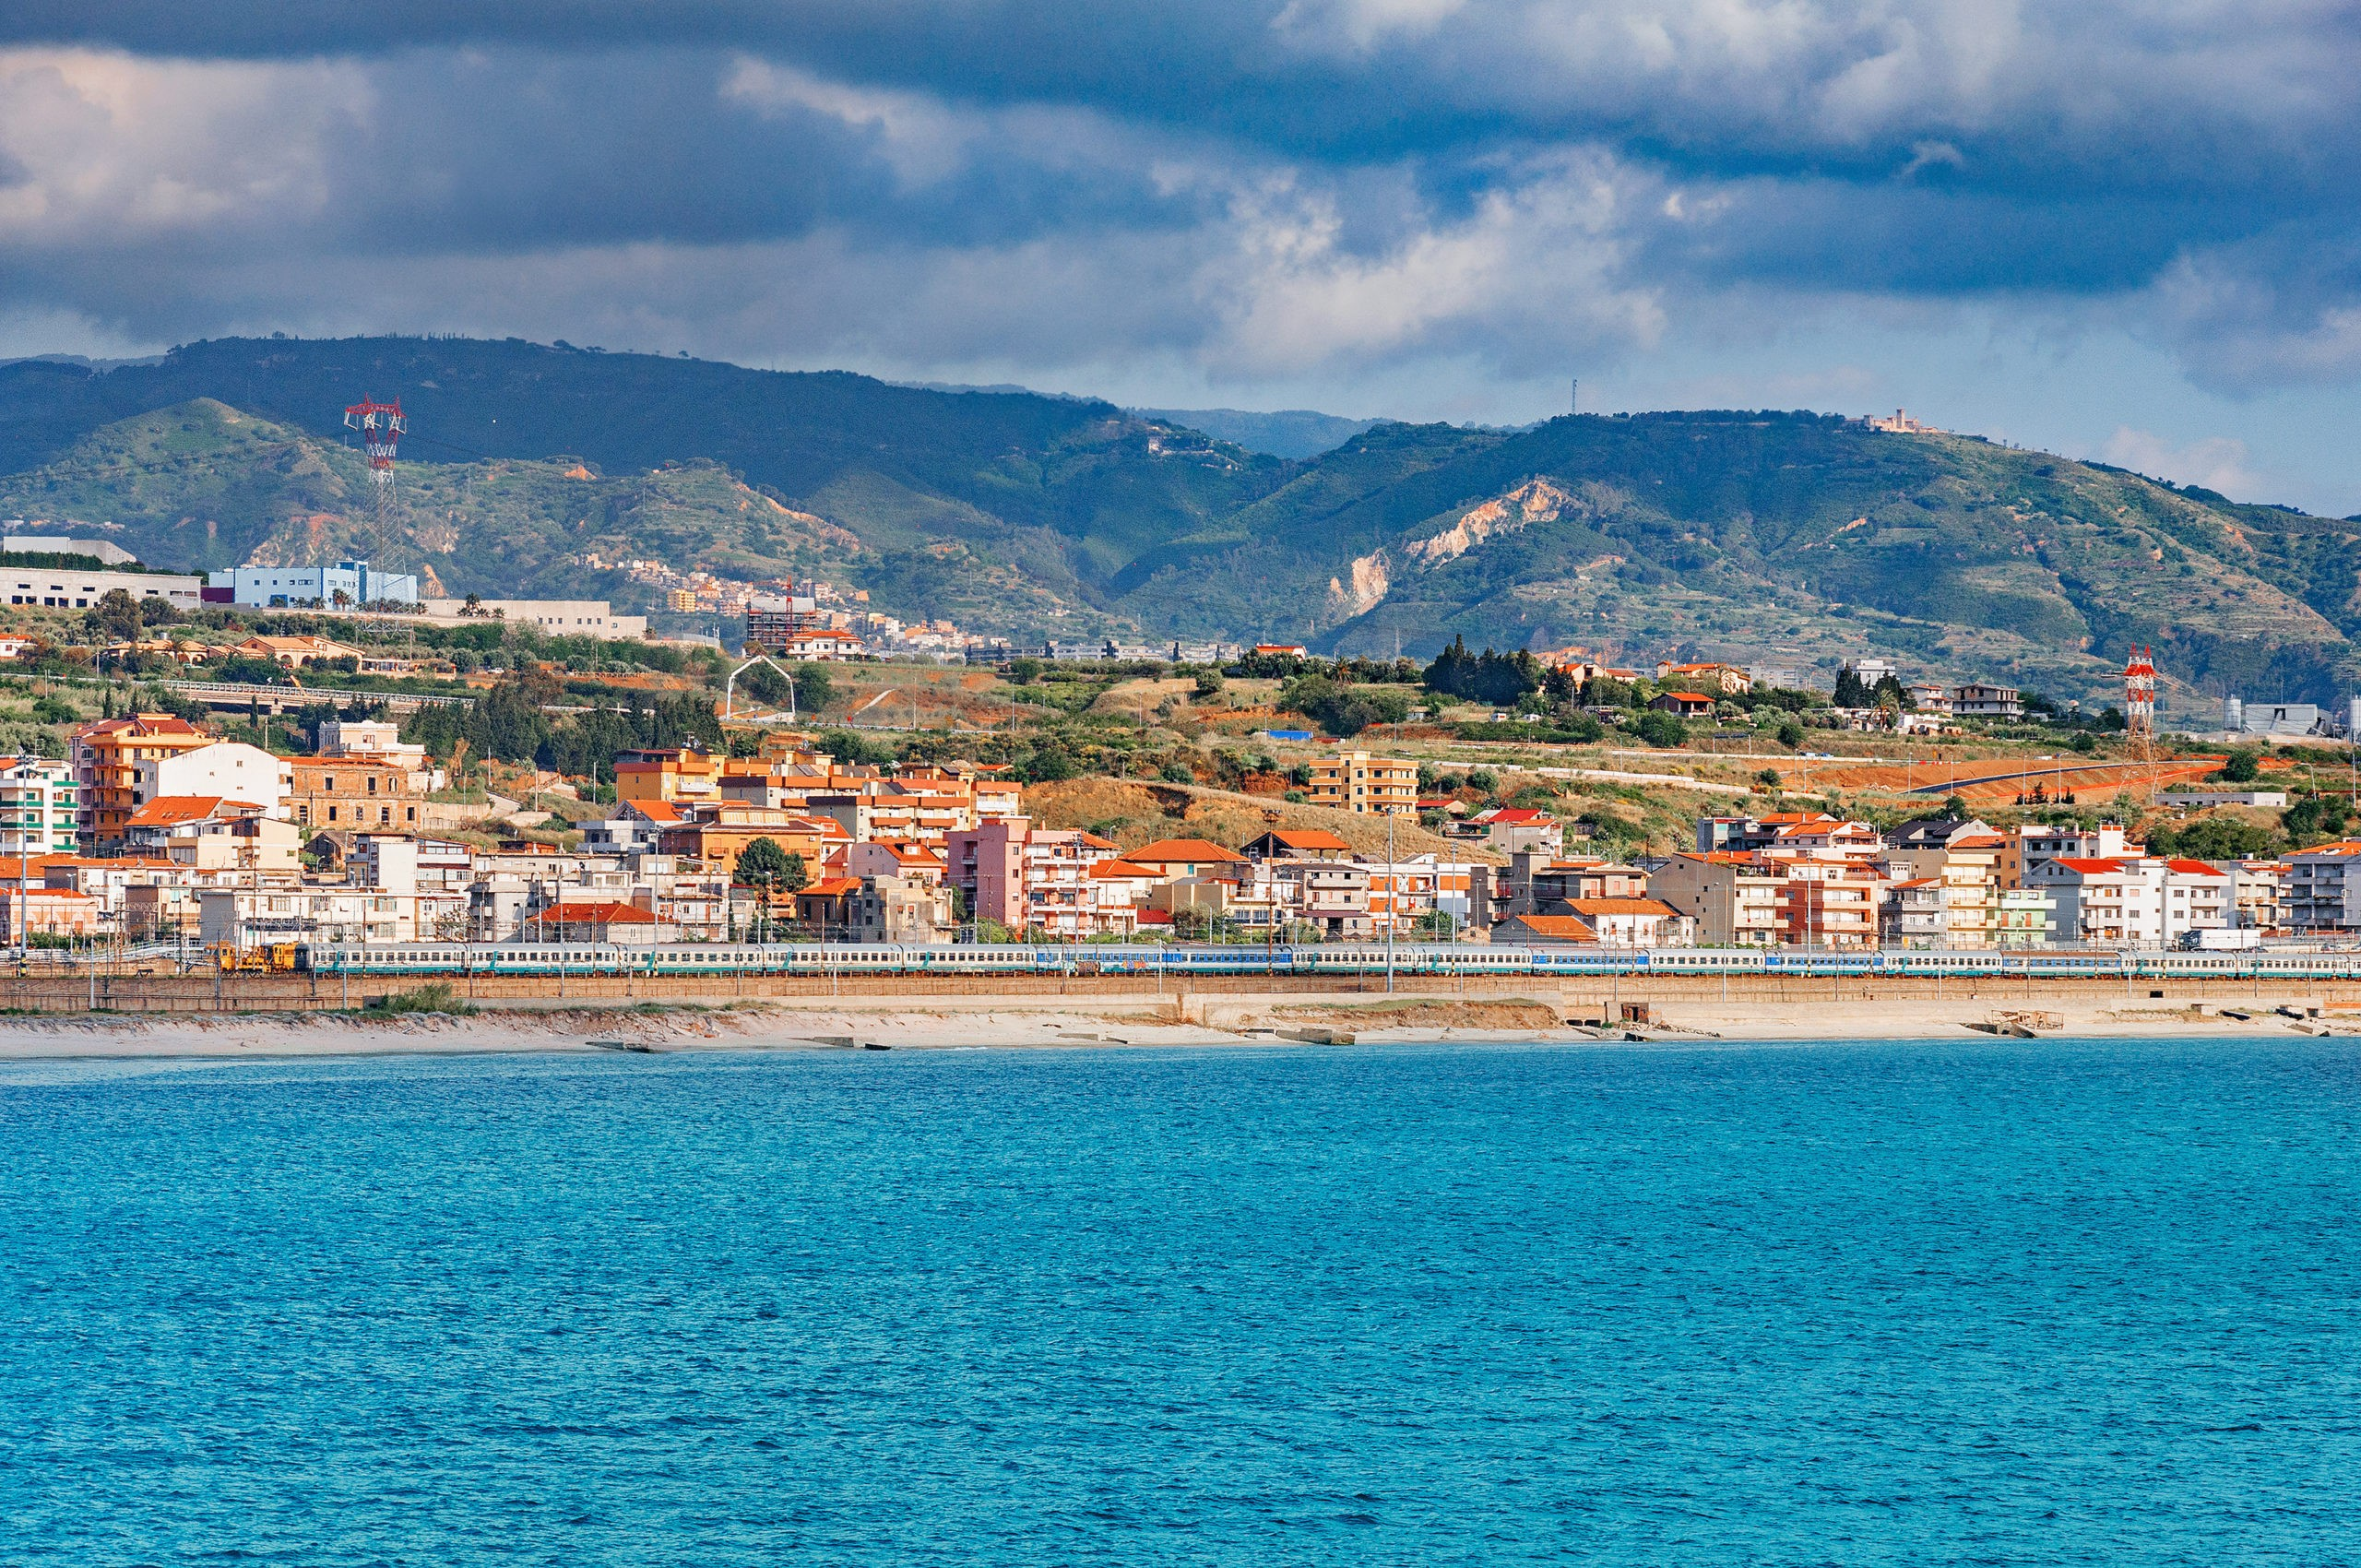 Plaże, zabytki i jeden nieudany deser. Reggio di Calabria- nieznana perła Italii